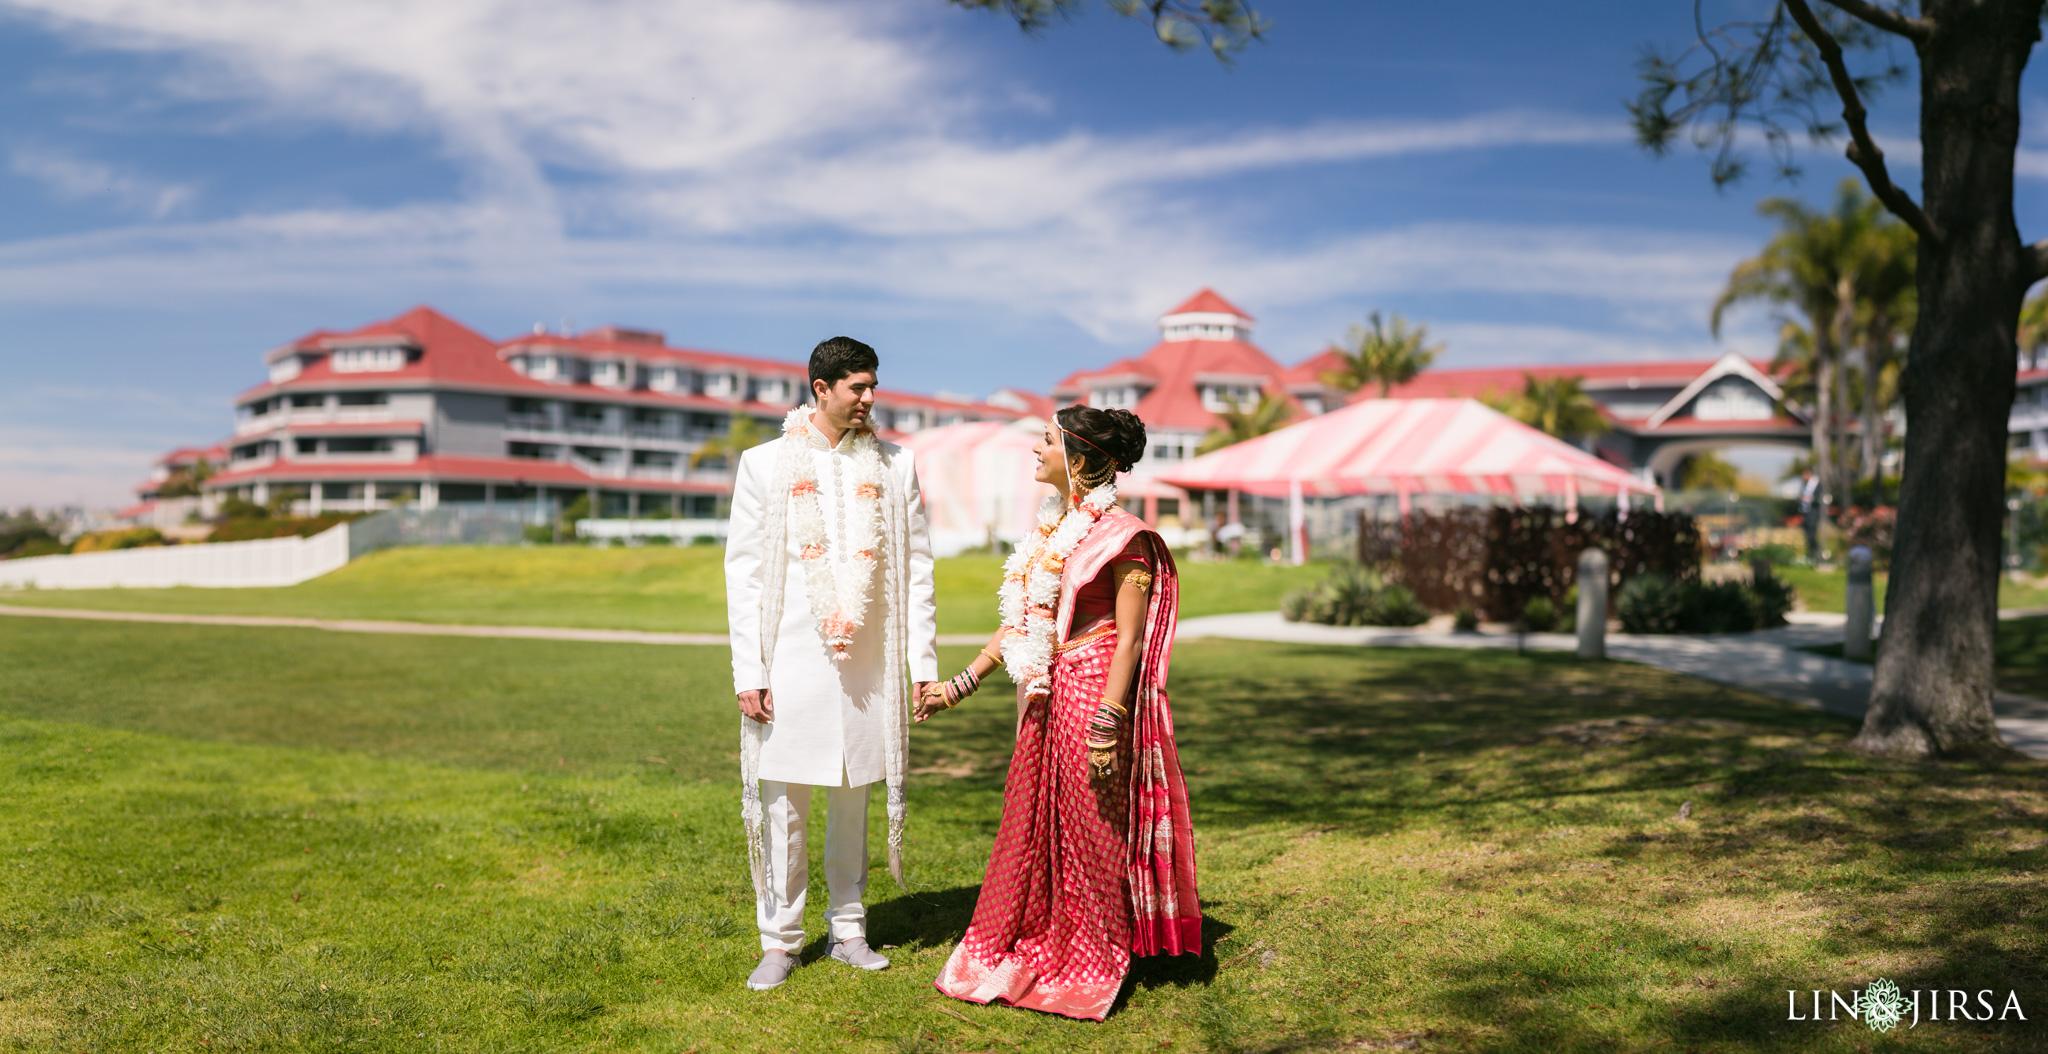 16-Laguna-cliffs-marriott-indian-fusion-wedding-photography